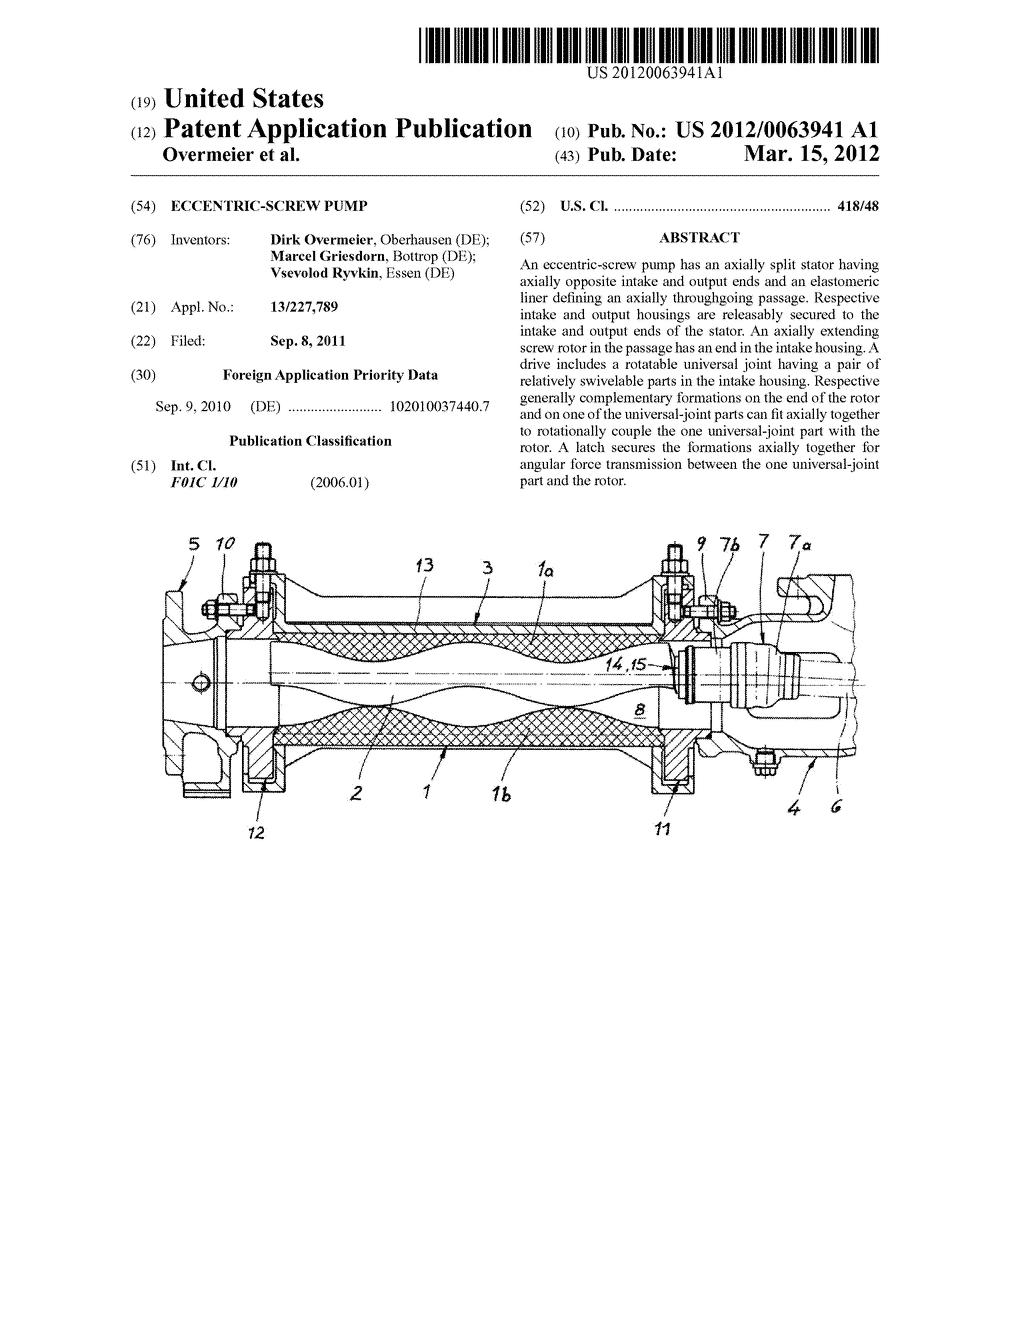 Eccentric screw pump diagram schematic and image 01 pooptronica